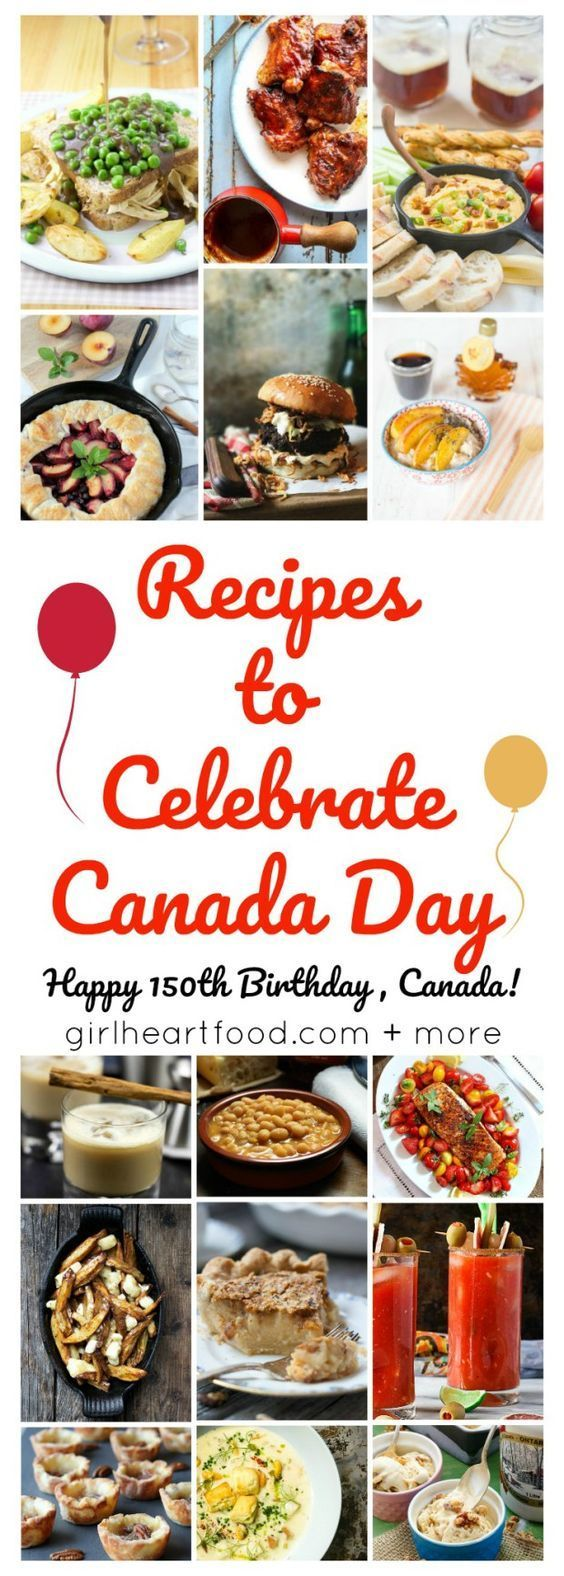 Recipes to Celebrate Canada Day